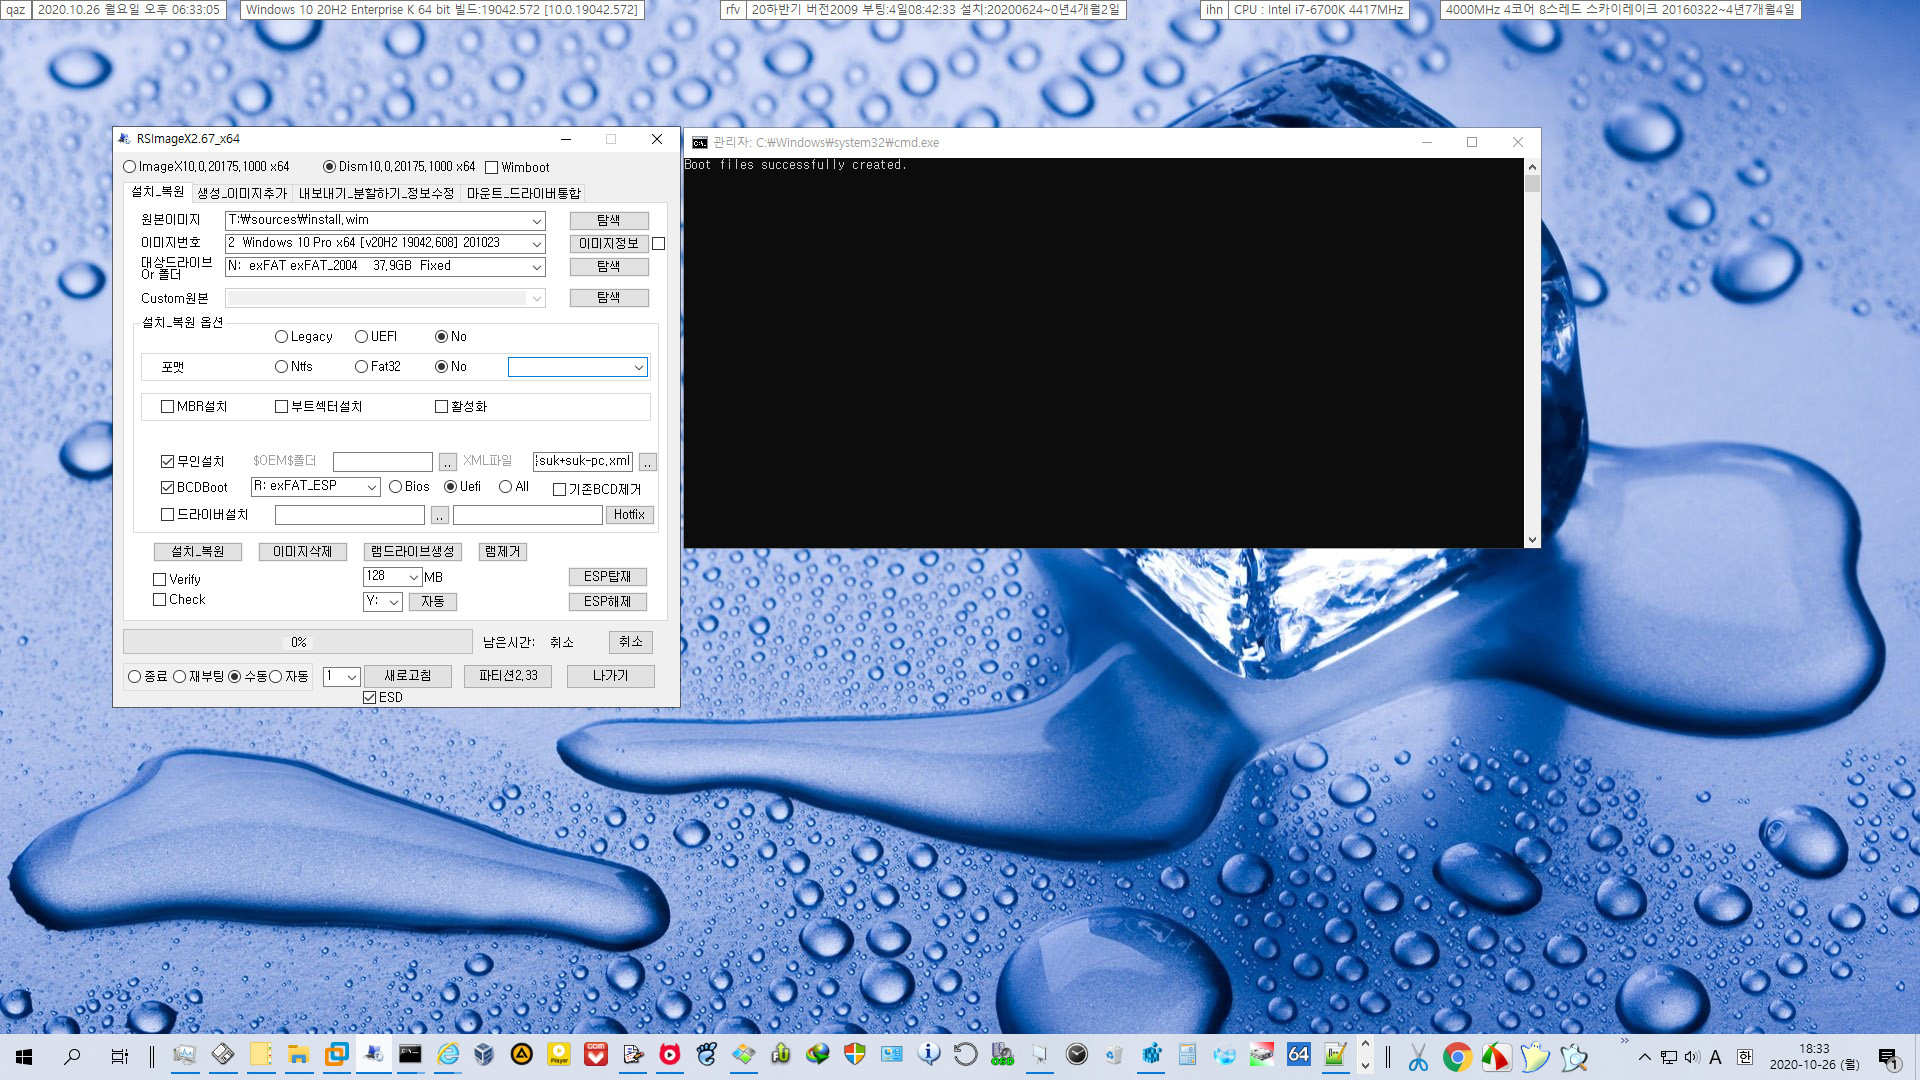 exFAT 포맷으로도 VHD 부팅이 Windows 10 버전 1903부터 된다고 하여 테스트 - 완전 생고생 했습니다 2020-10-26_183306.jpg